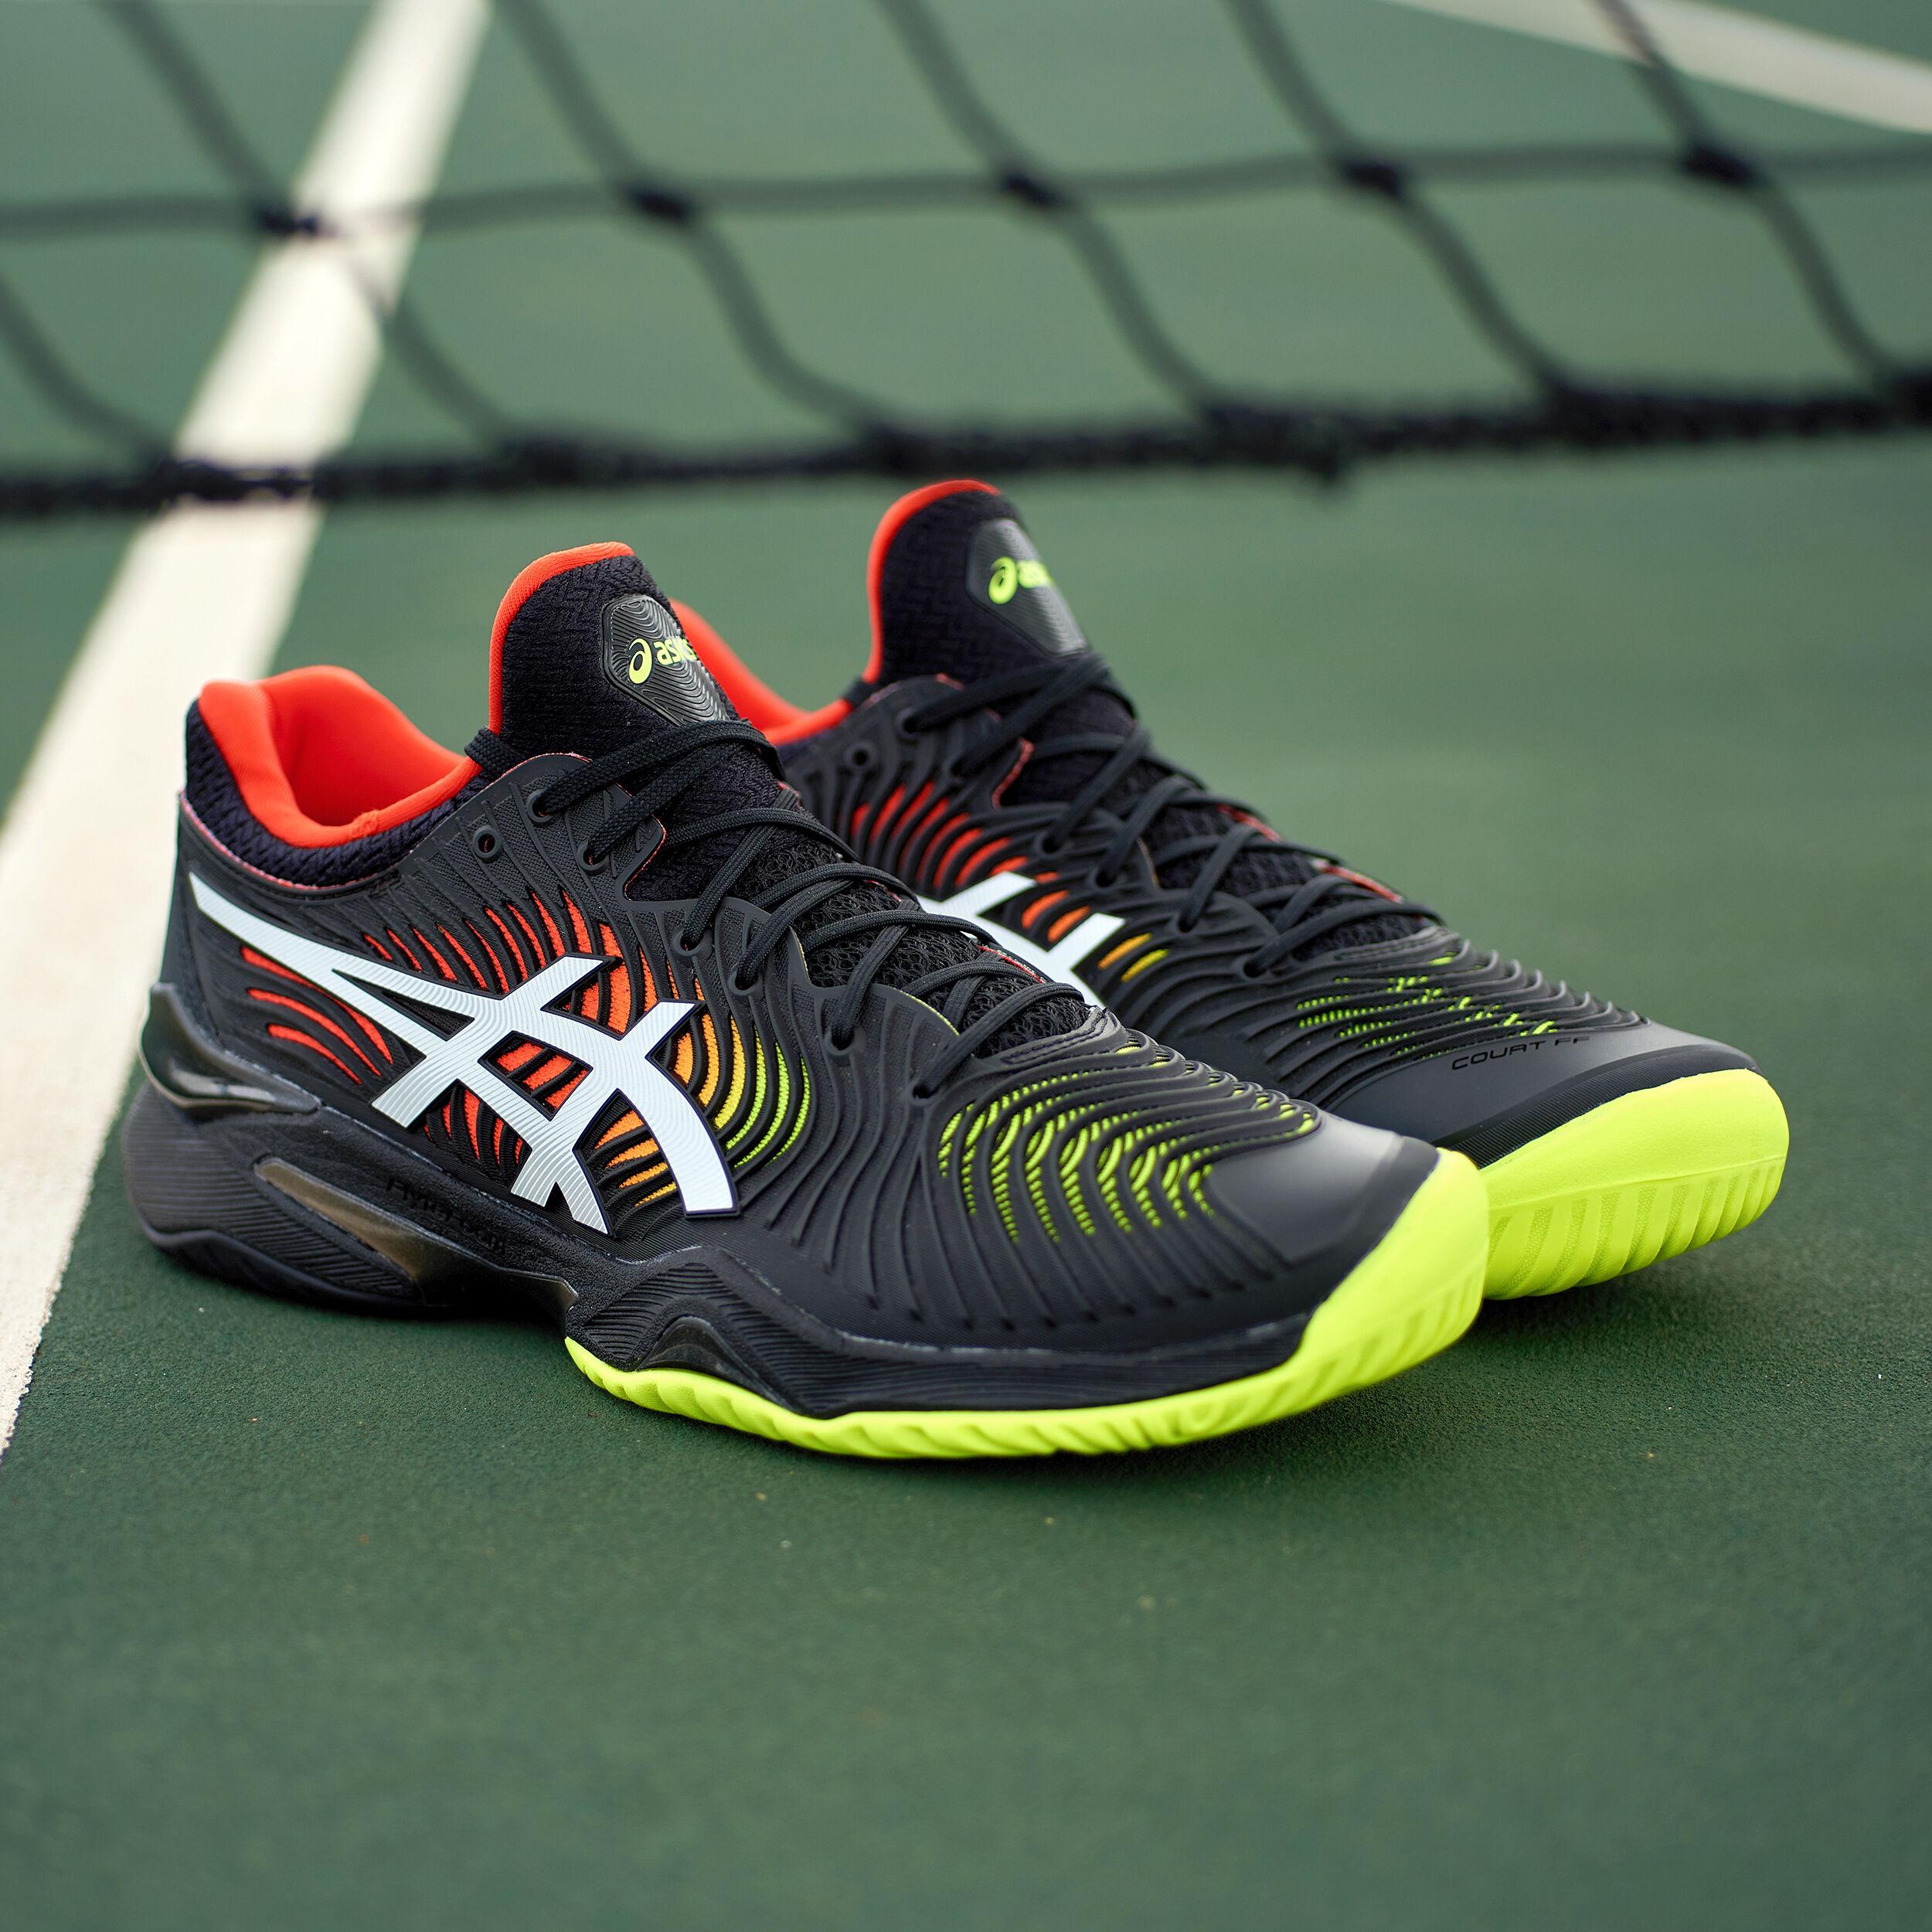 Men's COURT FF 2 CLAY   BLACKWHITE   Tennis   ASICS